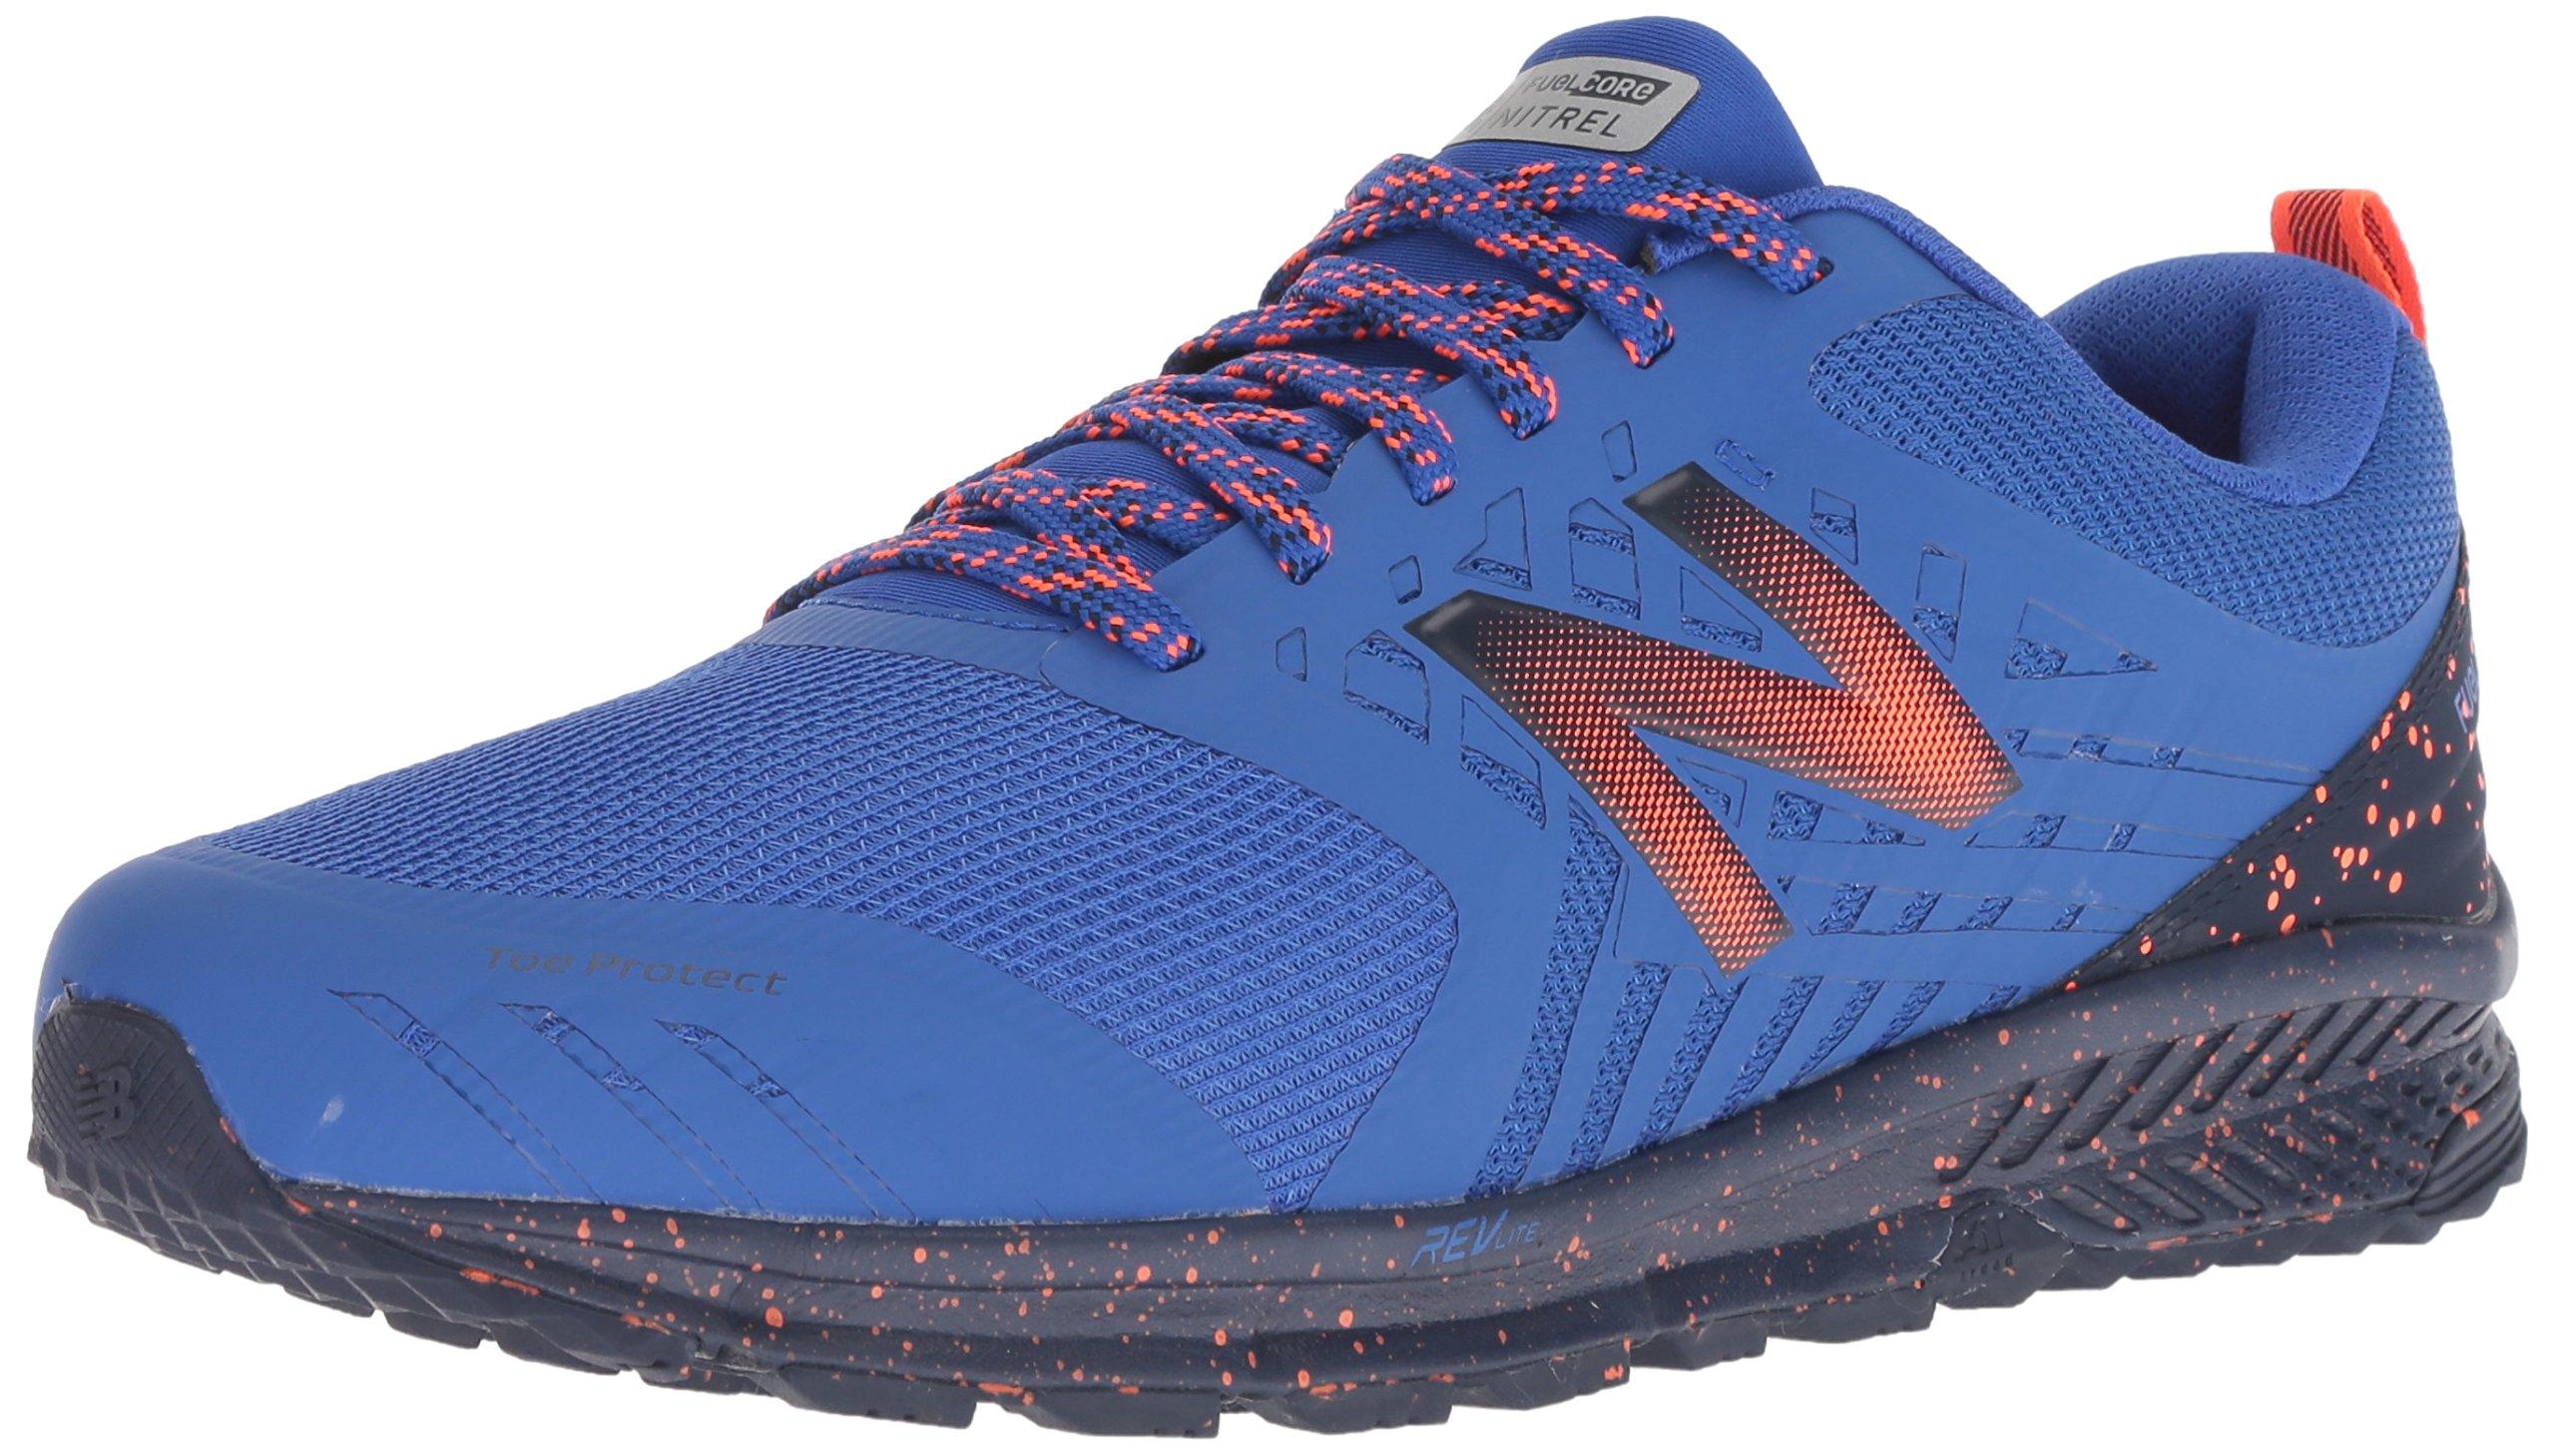 Trail Fuelcore Men's ShoePacific8 Us Nitrel Balance Running D V1 New WH9I2DE